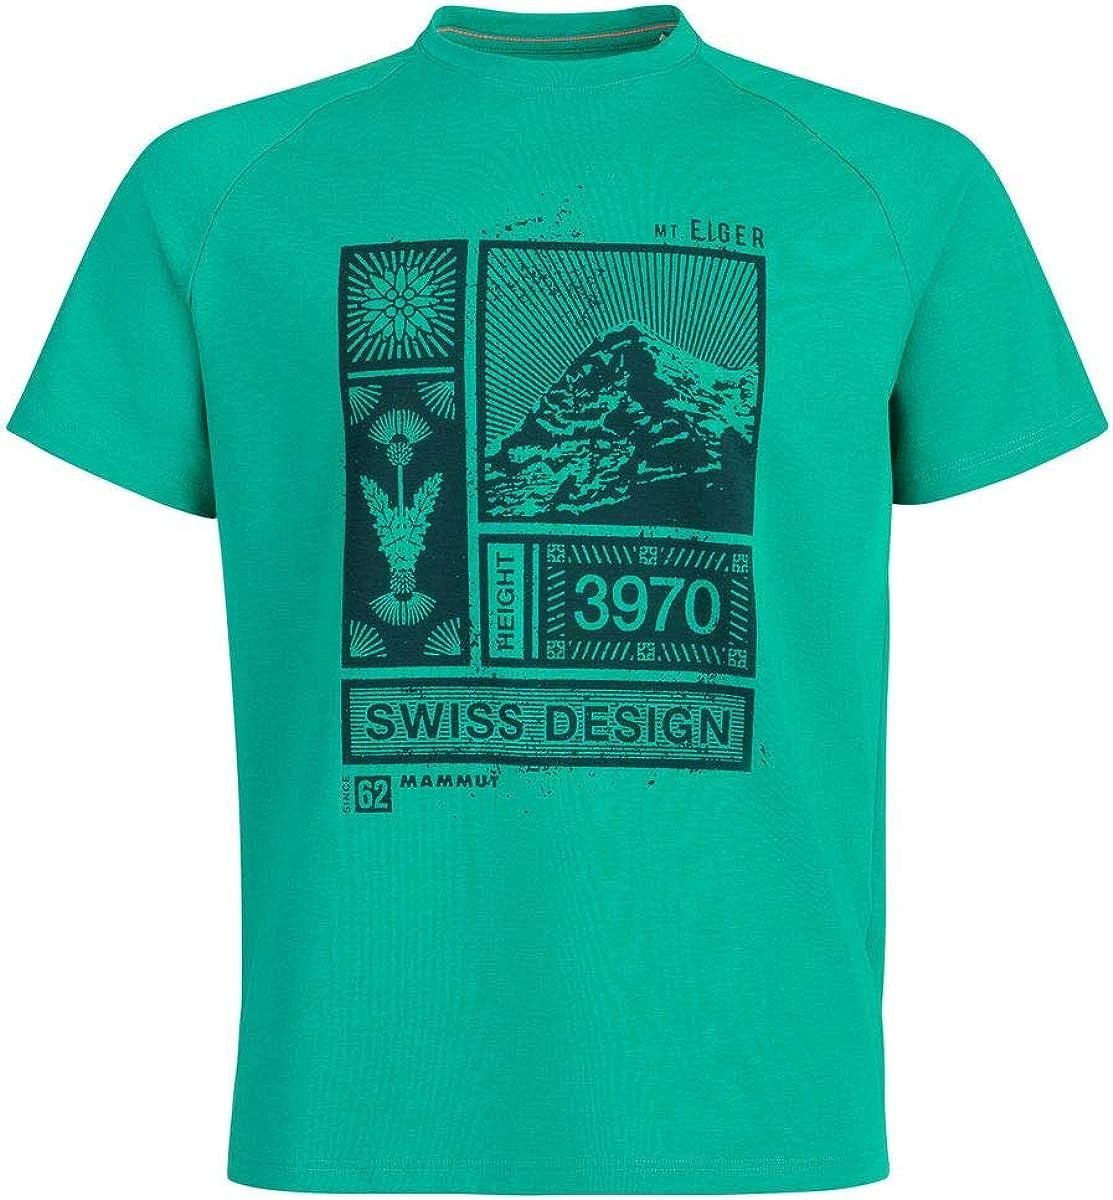 JIEHONGH Landscape and Mountain B8-19 Womens T-Shirt